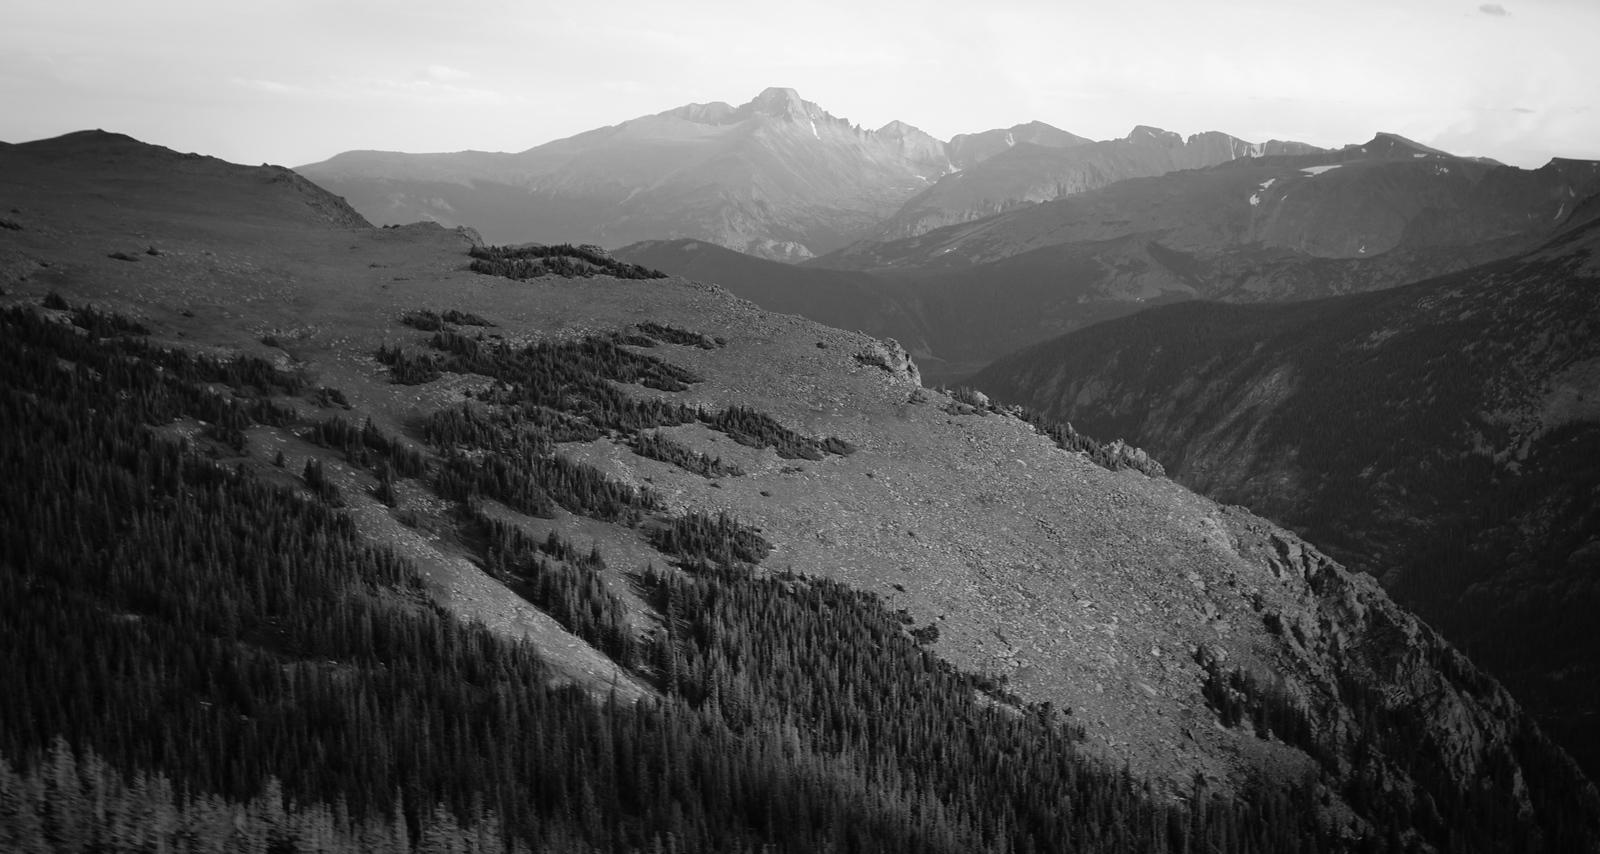 Longs Peak from Trail Ridge Road.